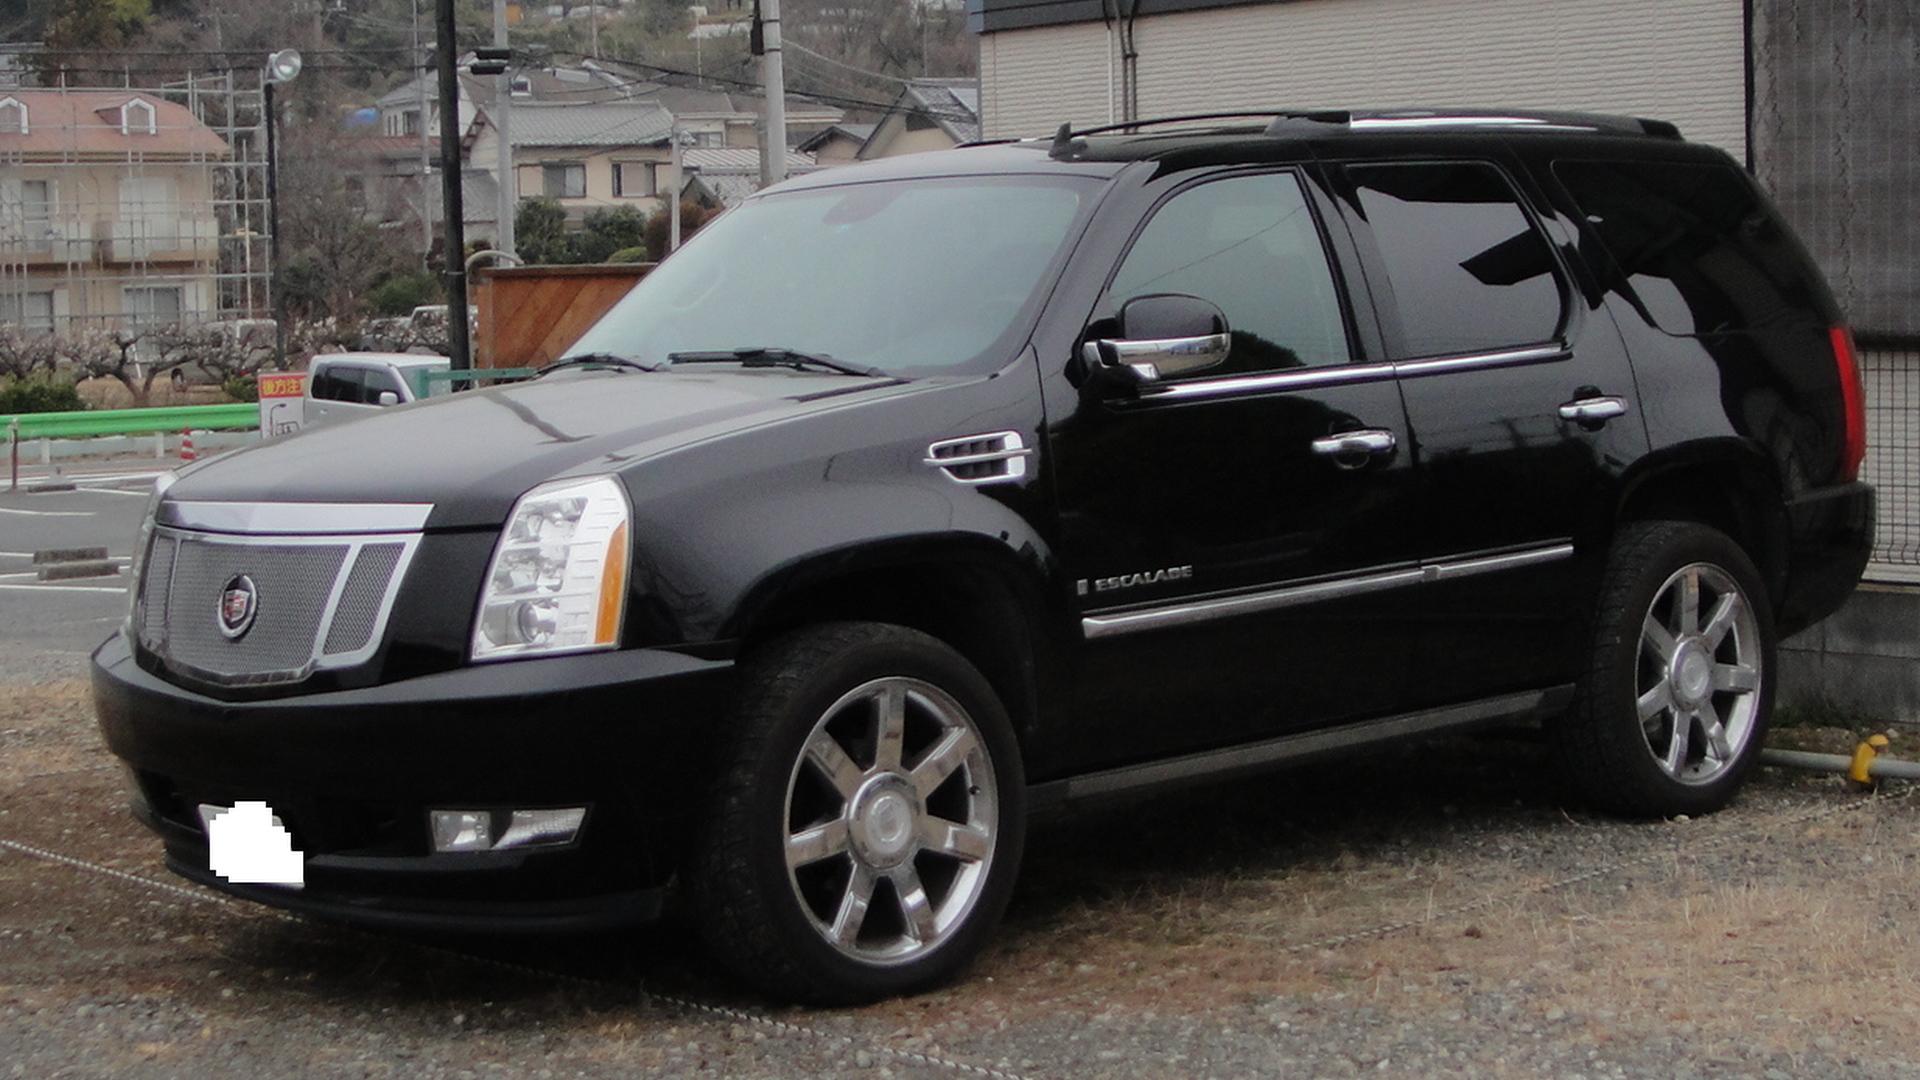 File:Cadillac Escalade-Tx-re.JPG - Wikimedia Commons